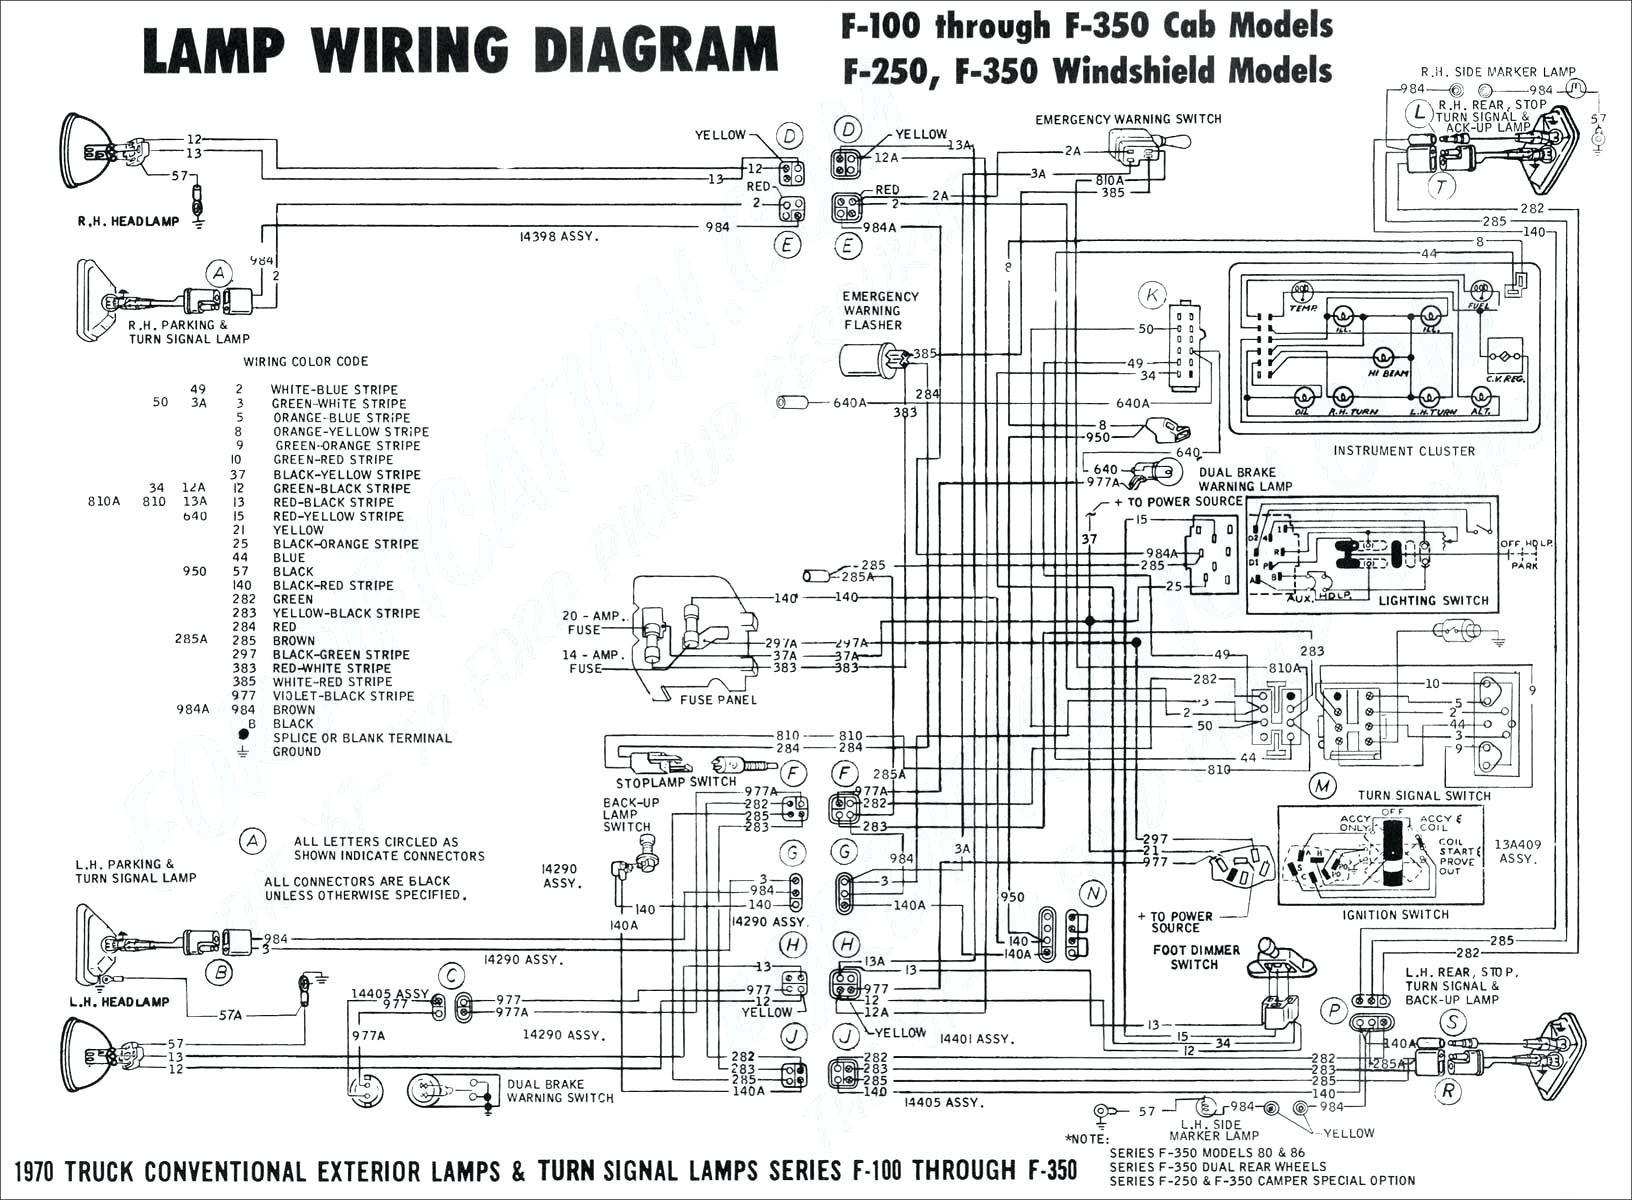 79 Chevy Truck Wiring Diagram Turn Signal Wiring Diagram Chevy Truck Shahsramblings Of 79 Chevy Truck Wiring Diagram